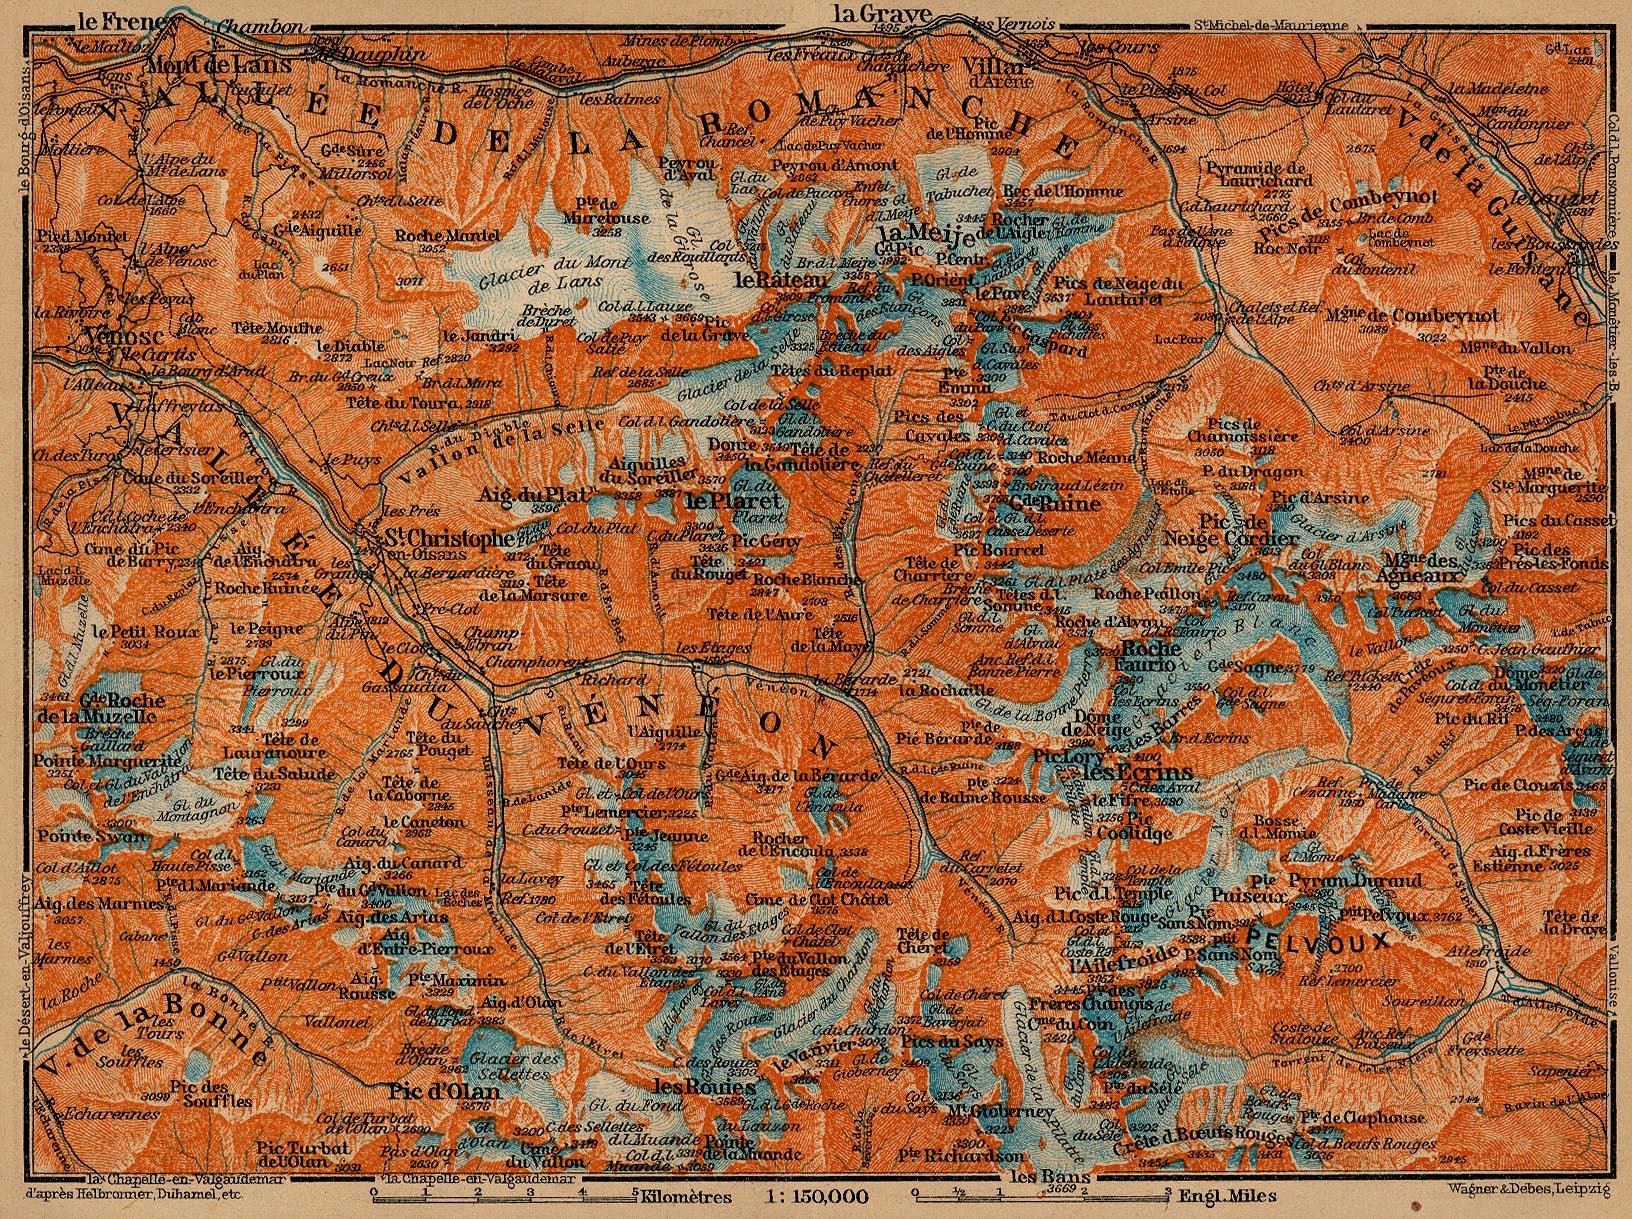 Mapa del Grupo Pelvoux, Francia 1914